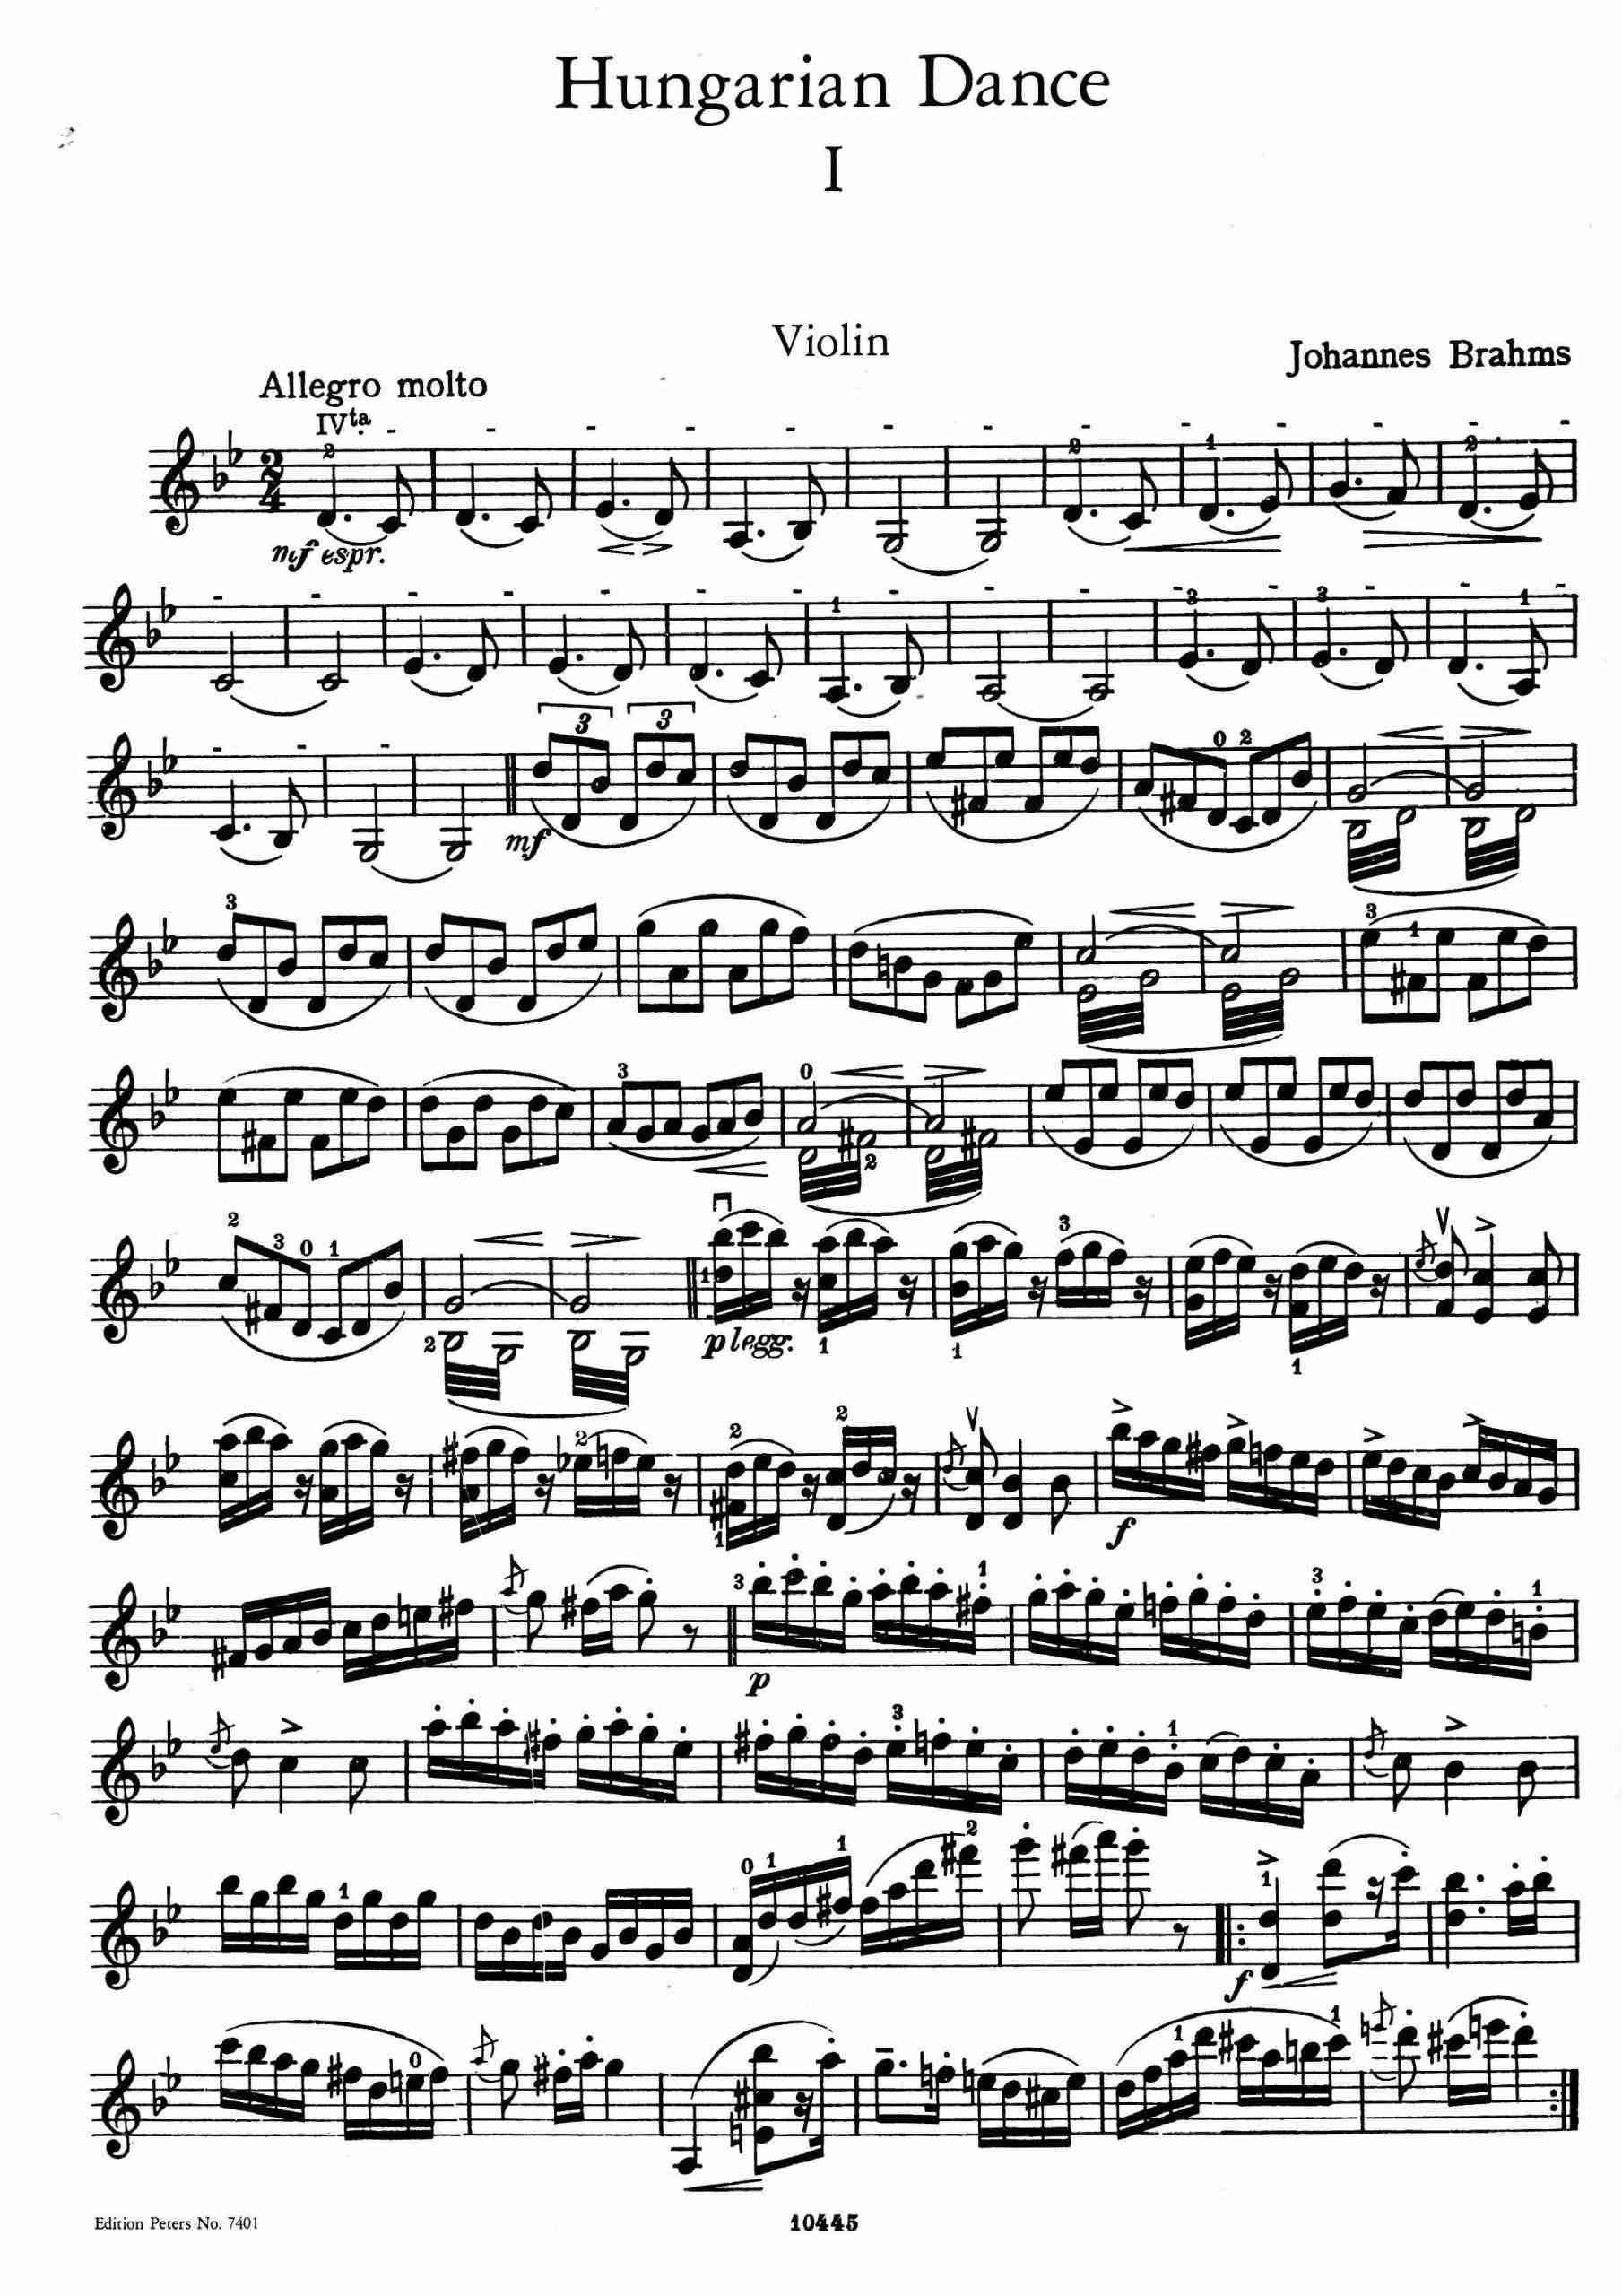 Brahms - 21 Hungarian Dances (Piano), WoO 1 (Nos.1,3,5 vln&pno)